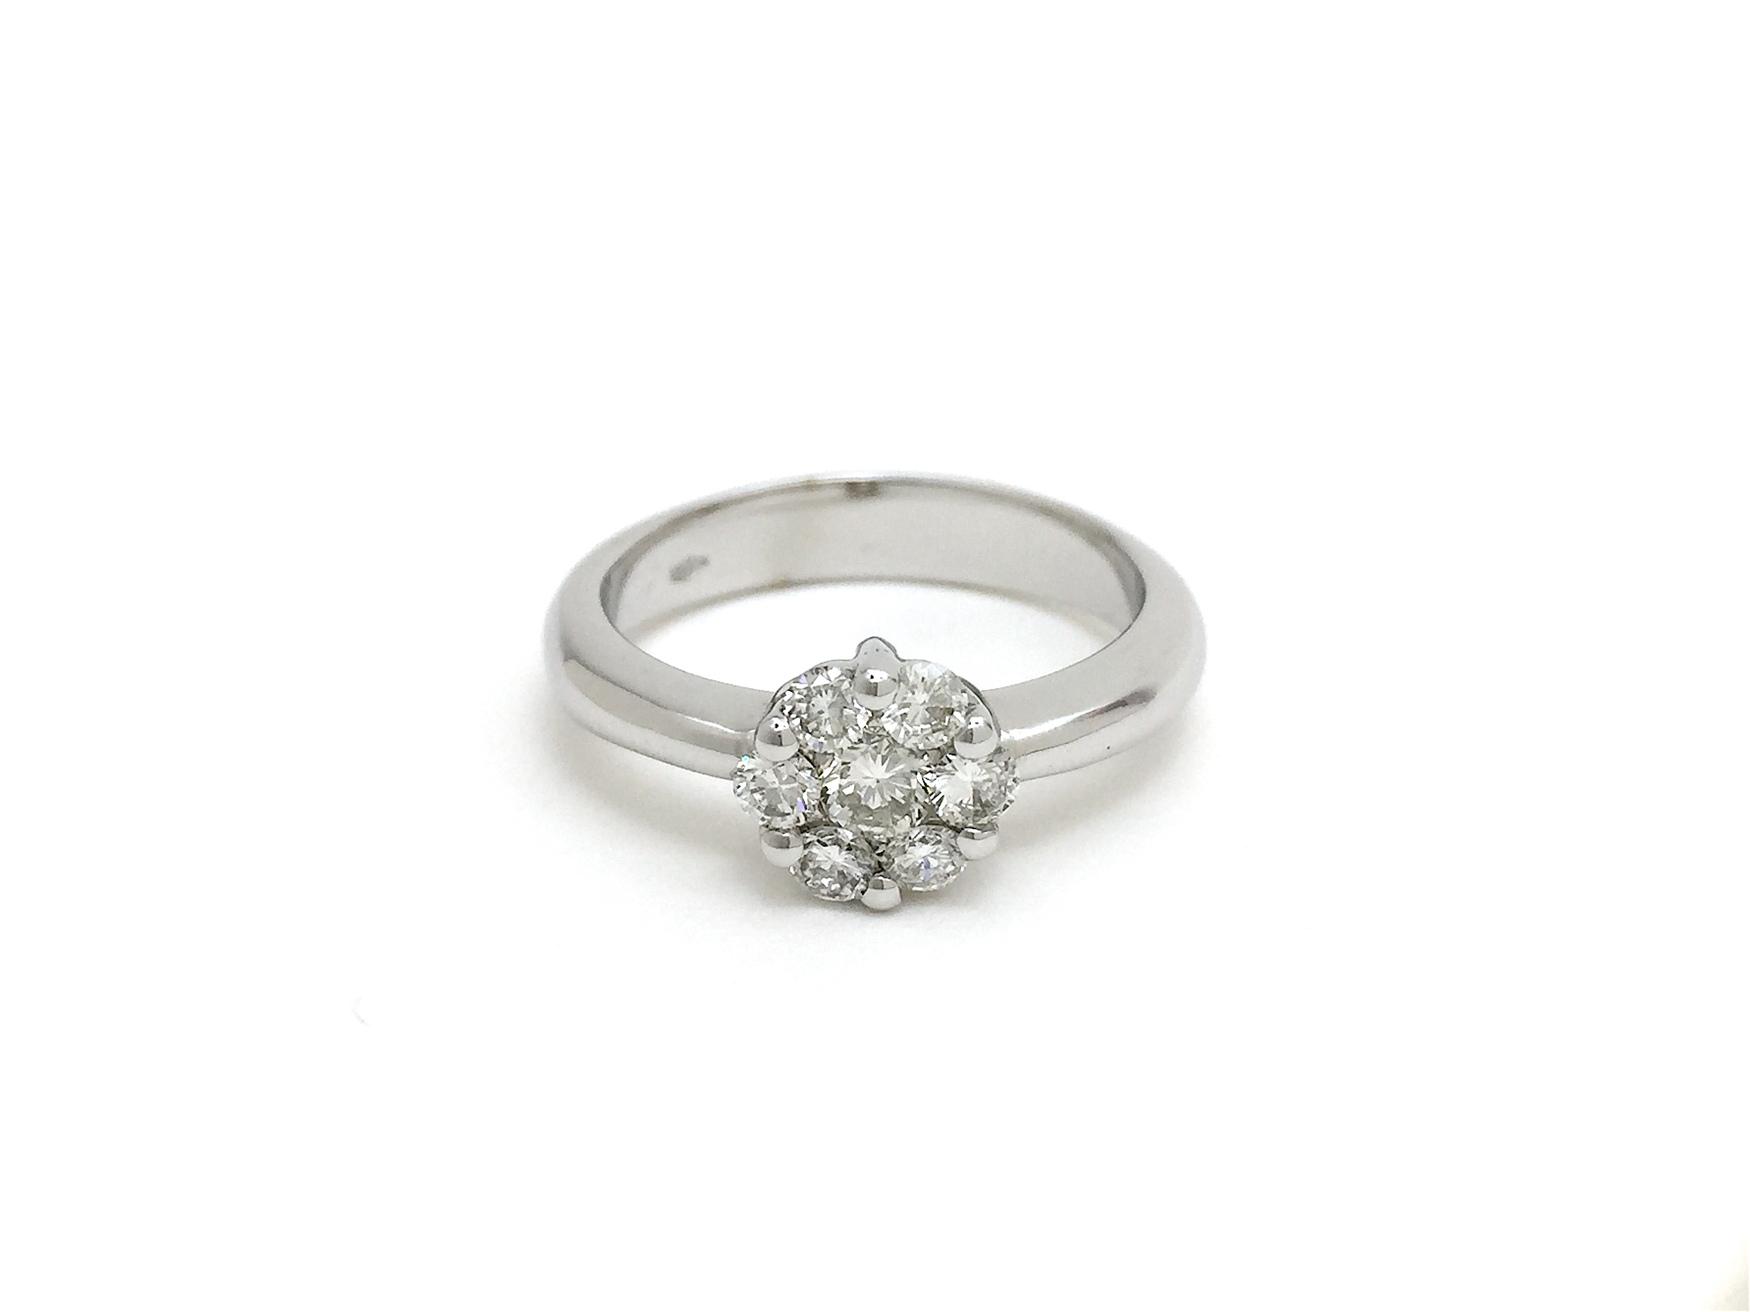 Sensi joyas jewellery Granada silver engagementDIAMONDS  RING